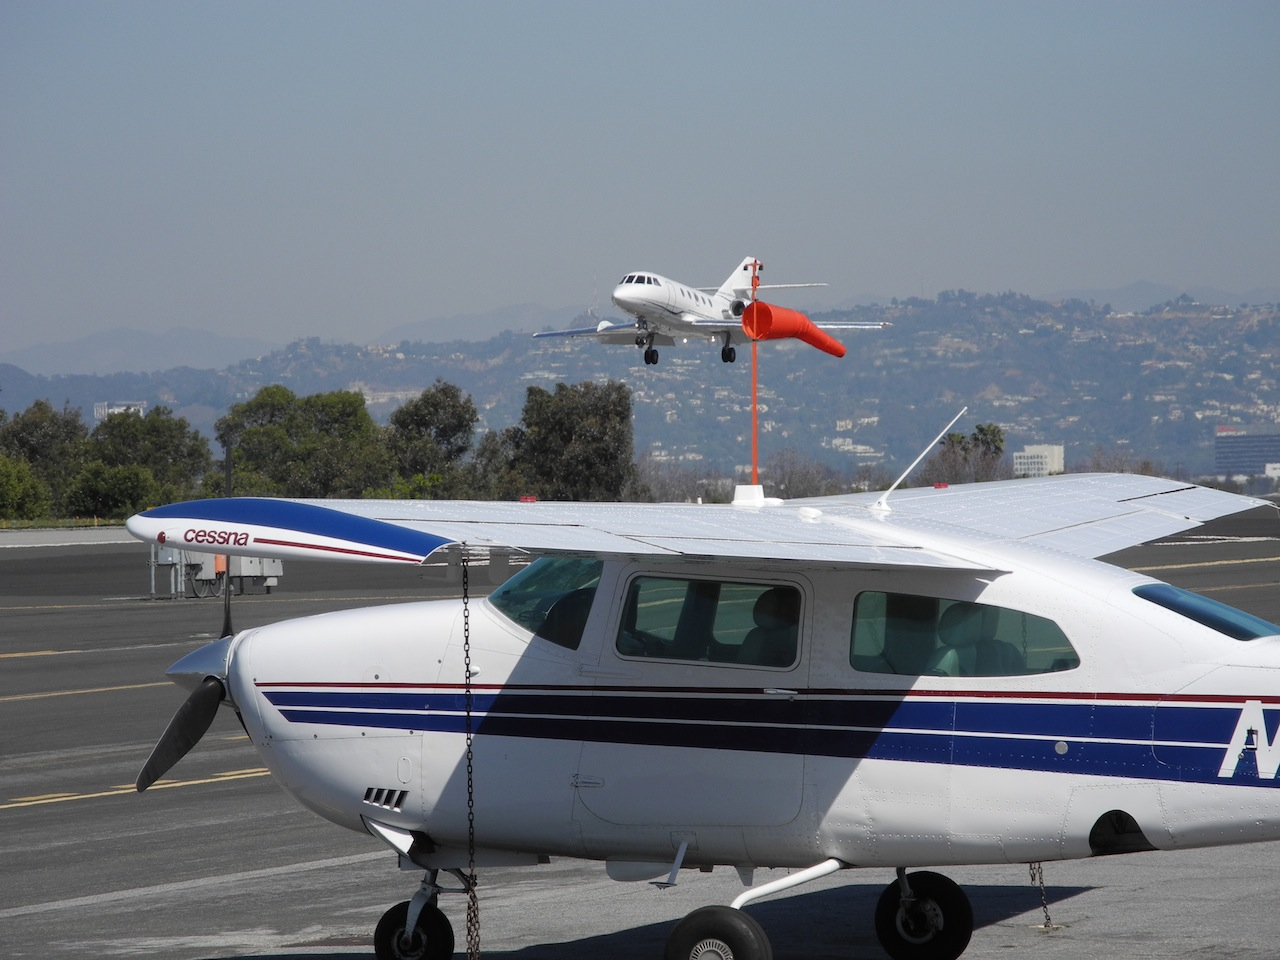 Santa Monica Airport private jet taking off